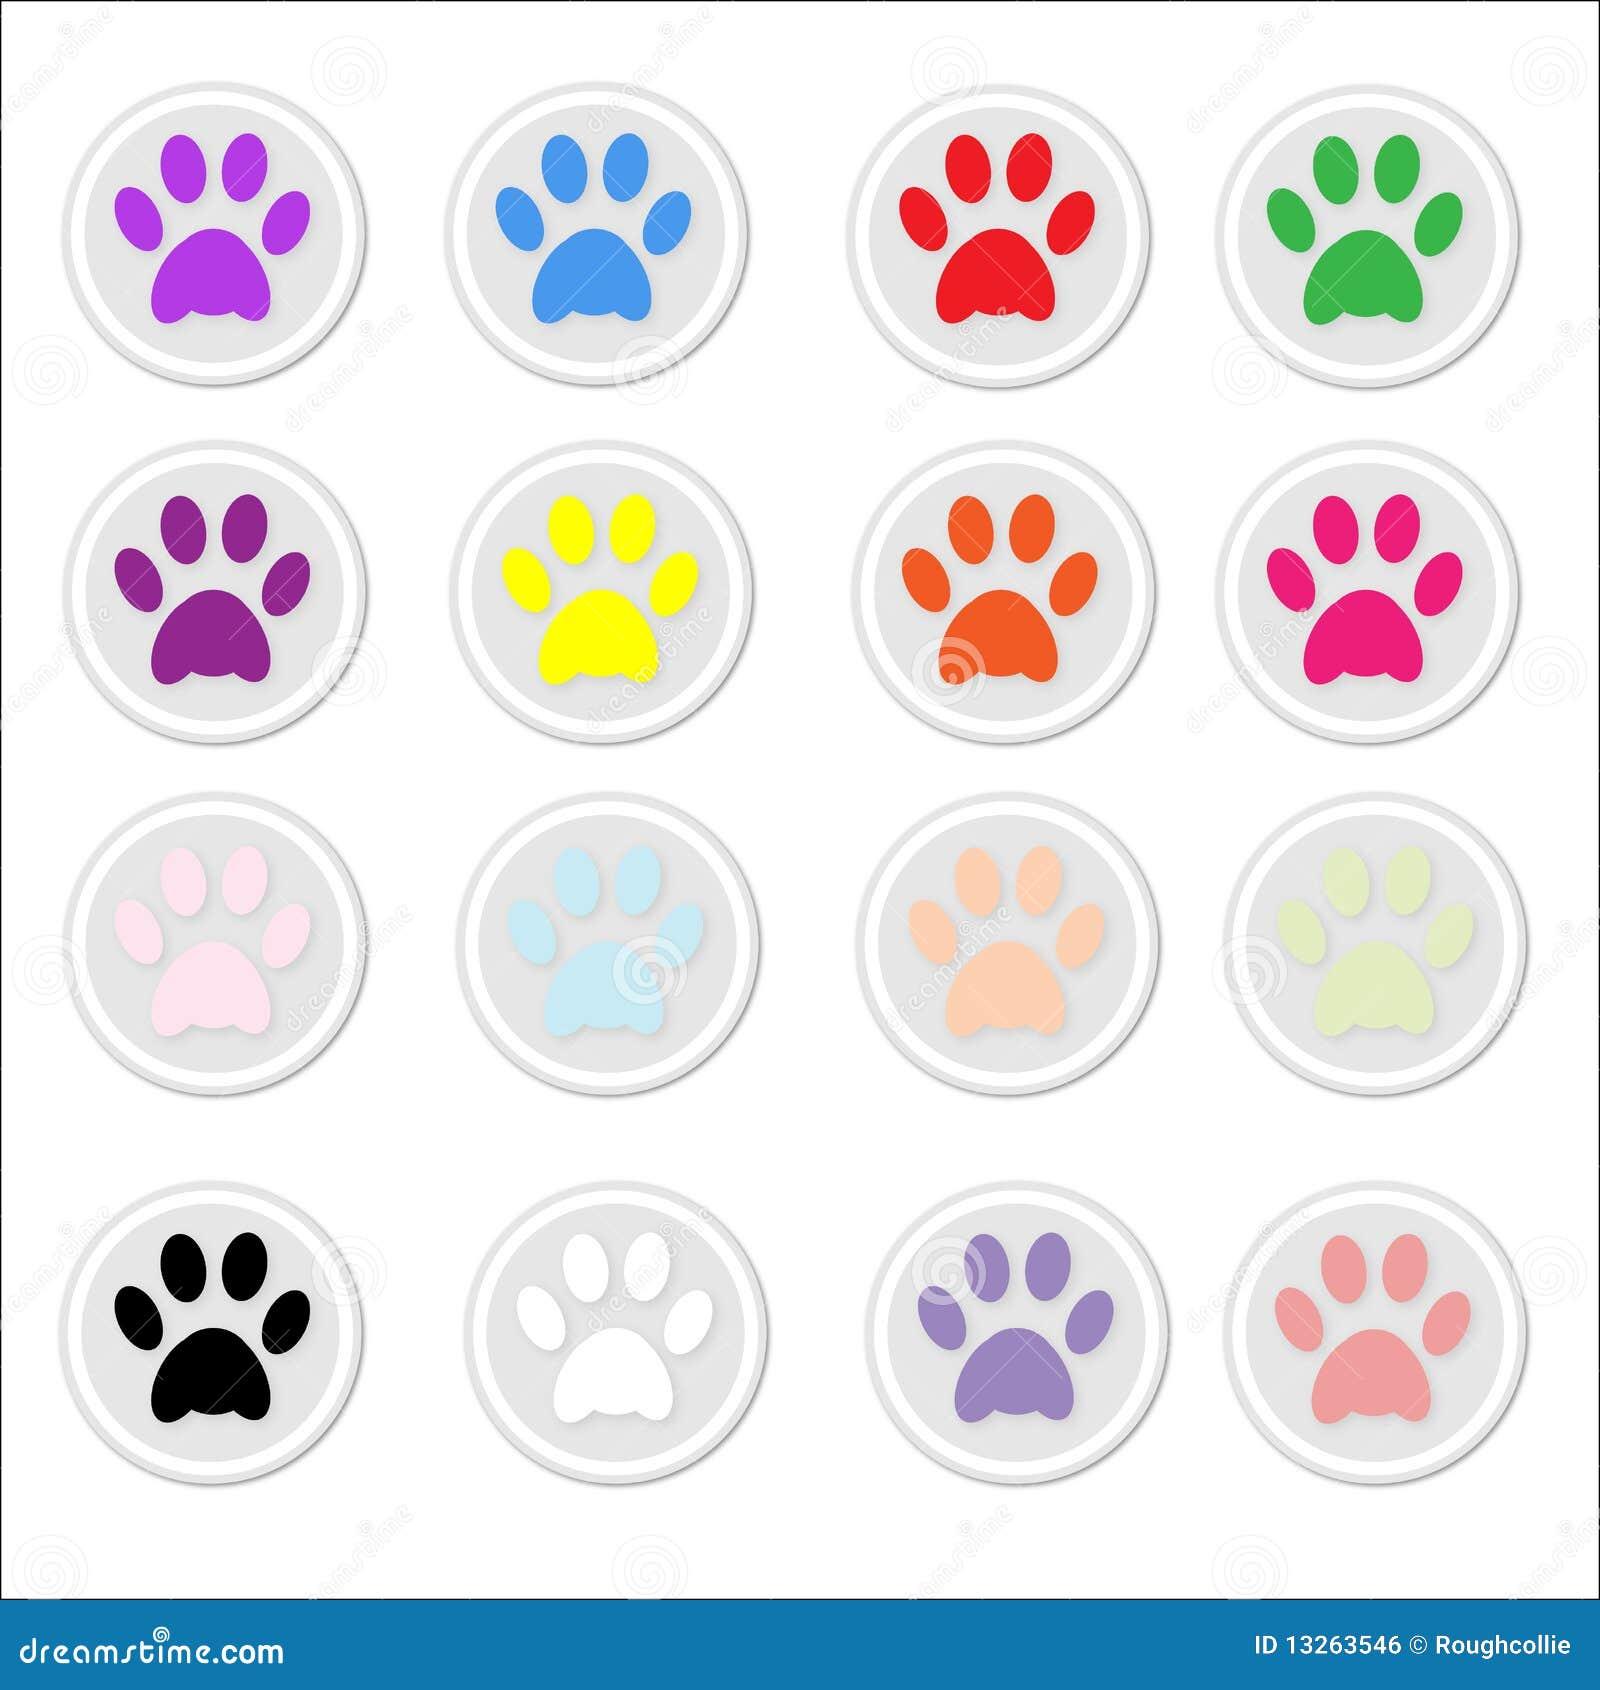 3bdea2aa60c2 Paw Prints on stickers stock vector. Illustration of illustration ...